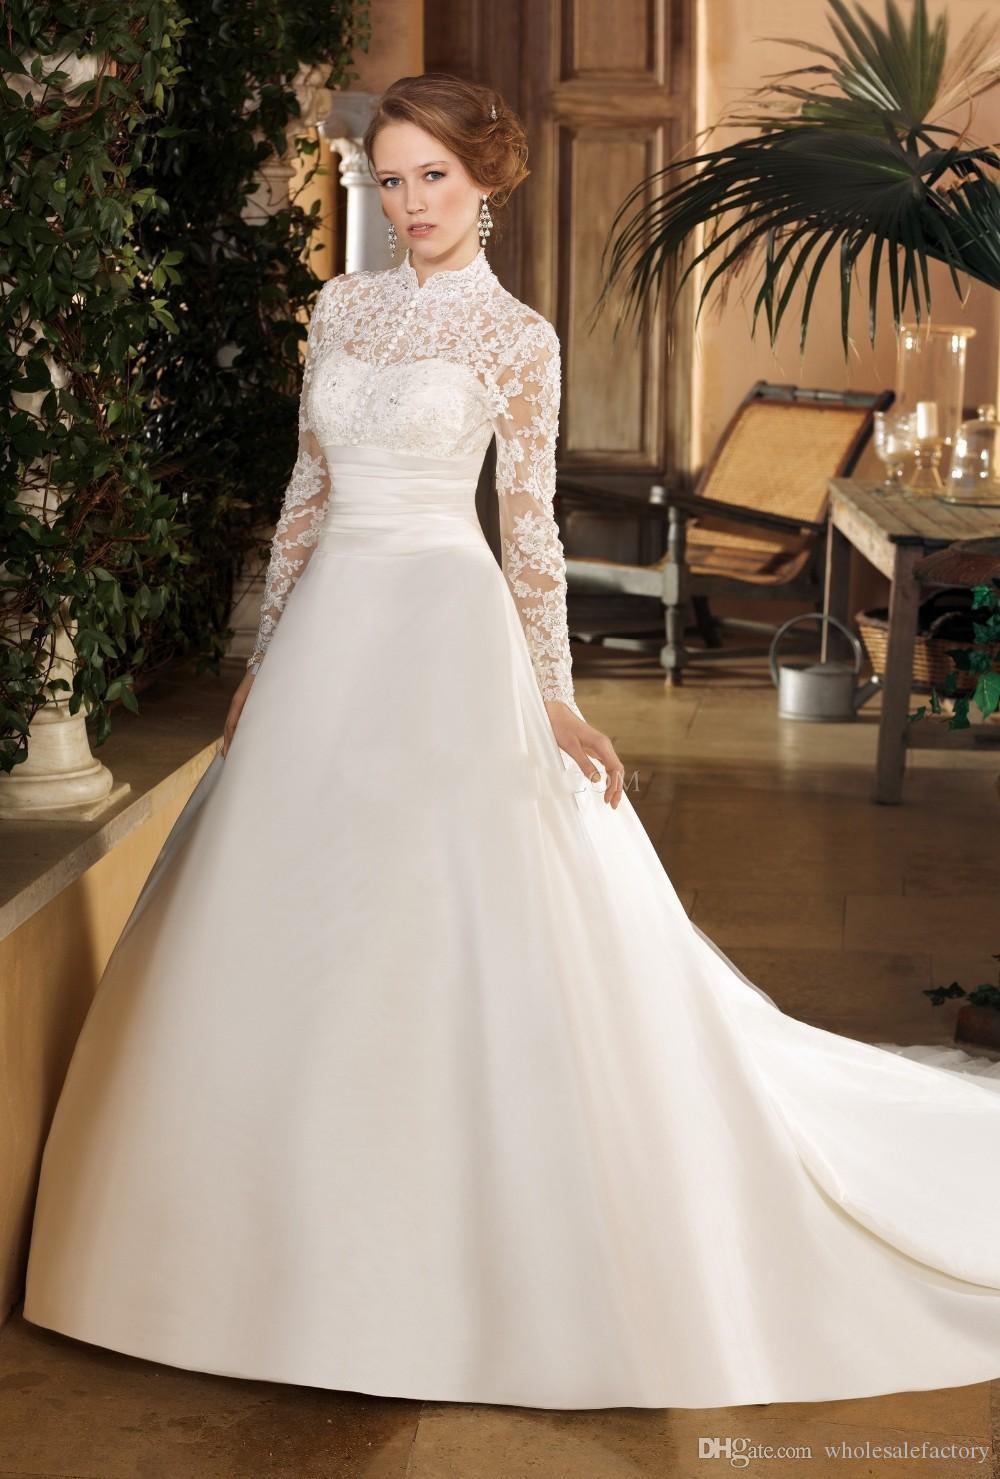 Modest Satin A Line Brautkleider High Neck Sheer Long Sleeves Tüll Spitze Applique Sweep Zug Hochzeit Brautkleider Roben de Mariée